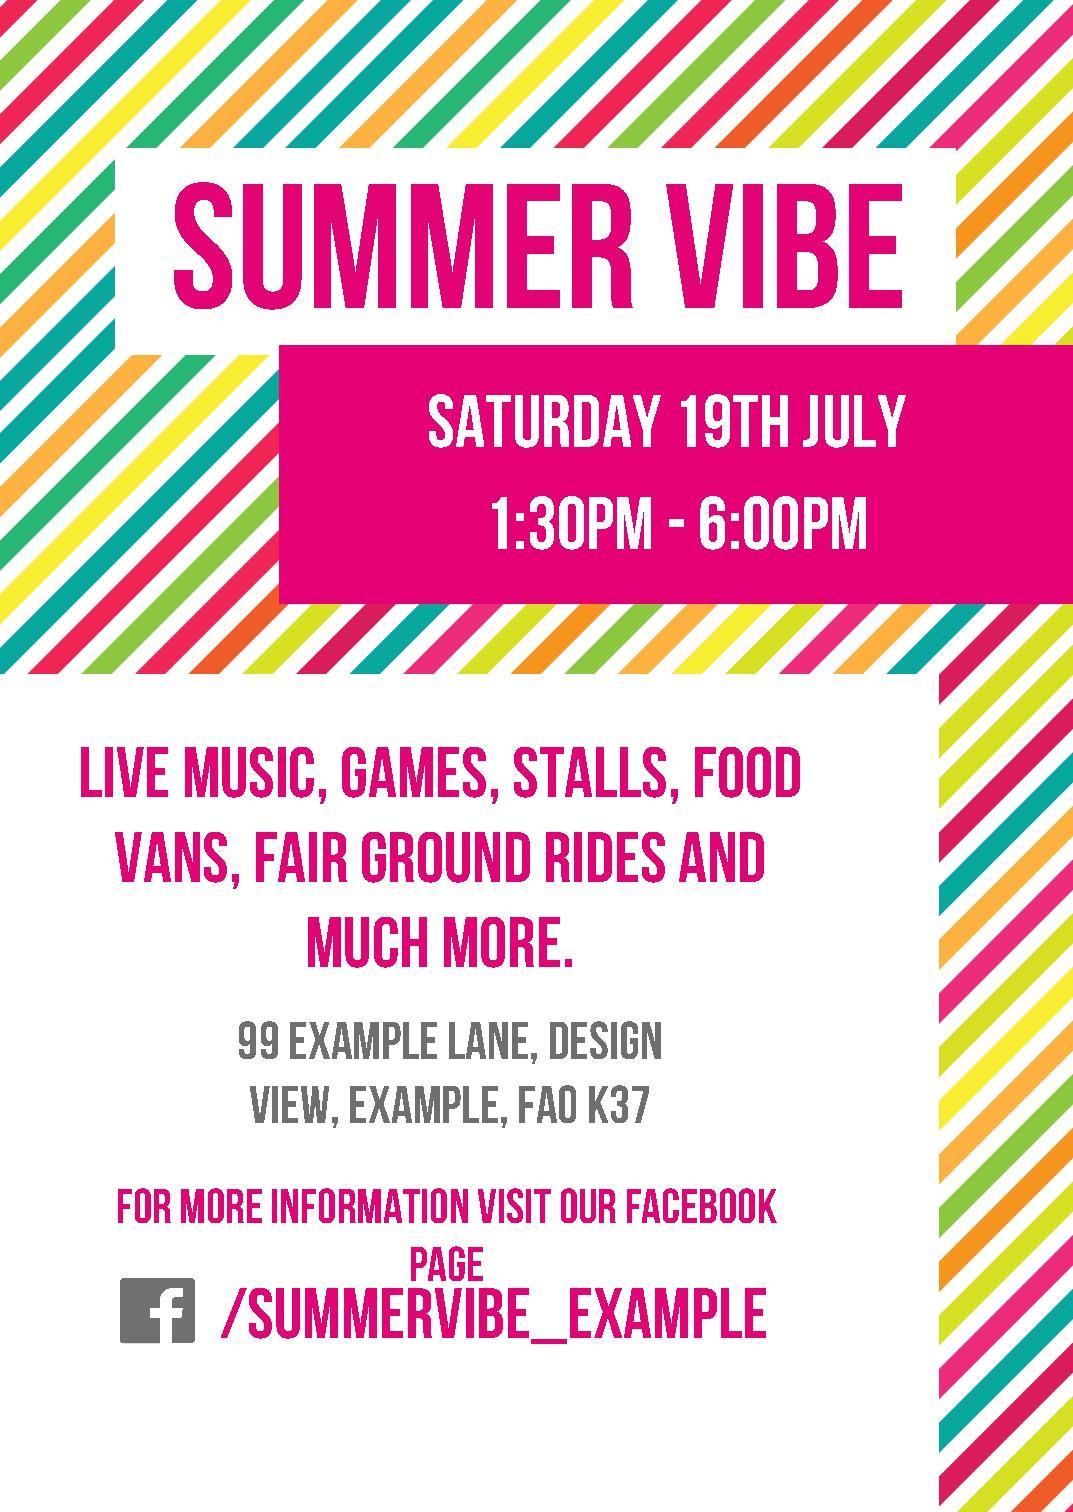 summer vibe correx signs design template